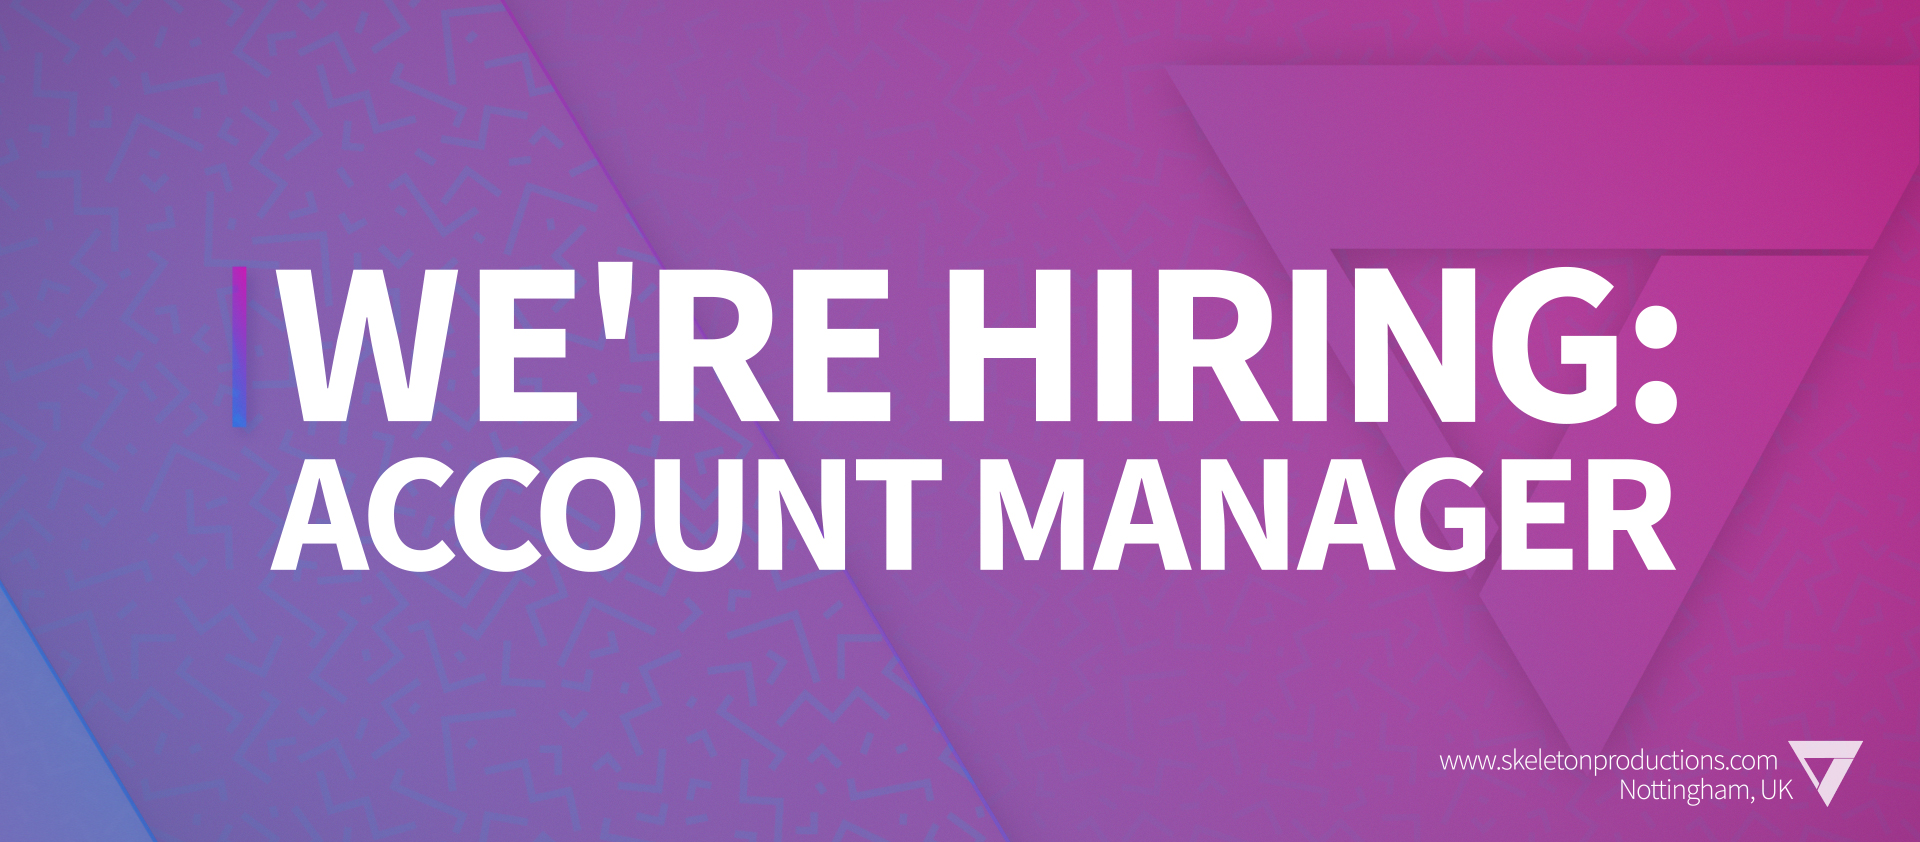 Account Manager_Blog Post_Header-1